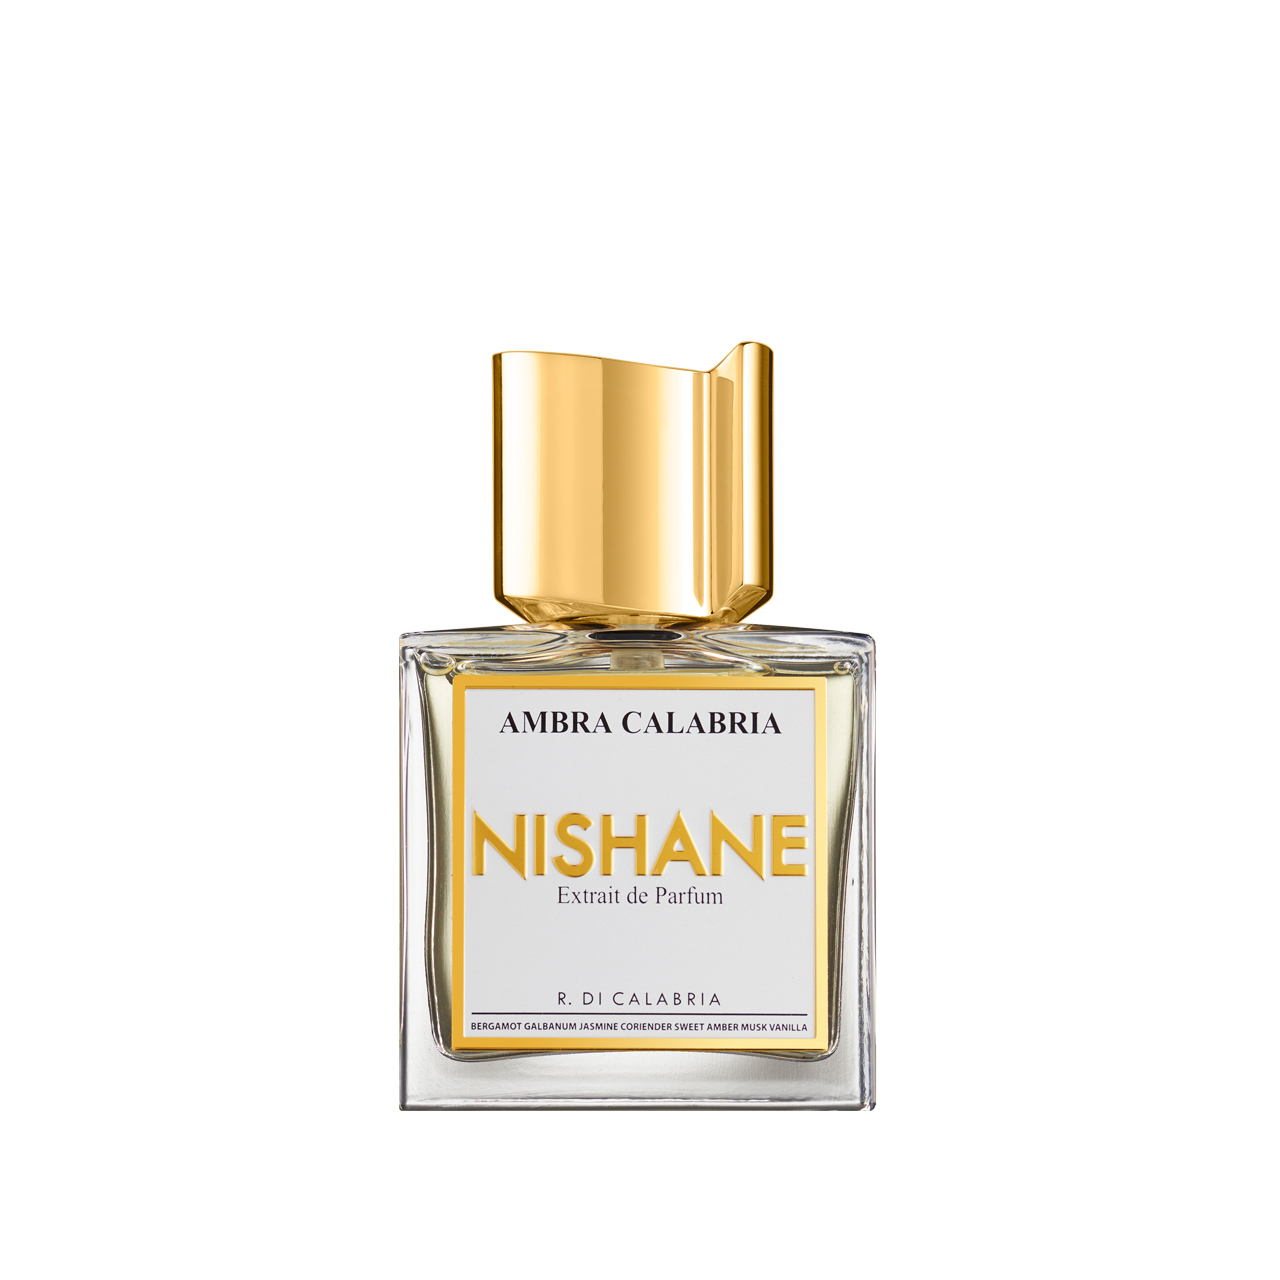 Ambra Calabria - Extrait de Parfum